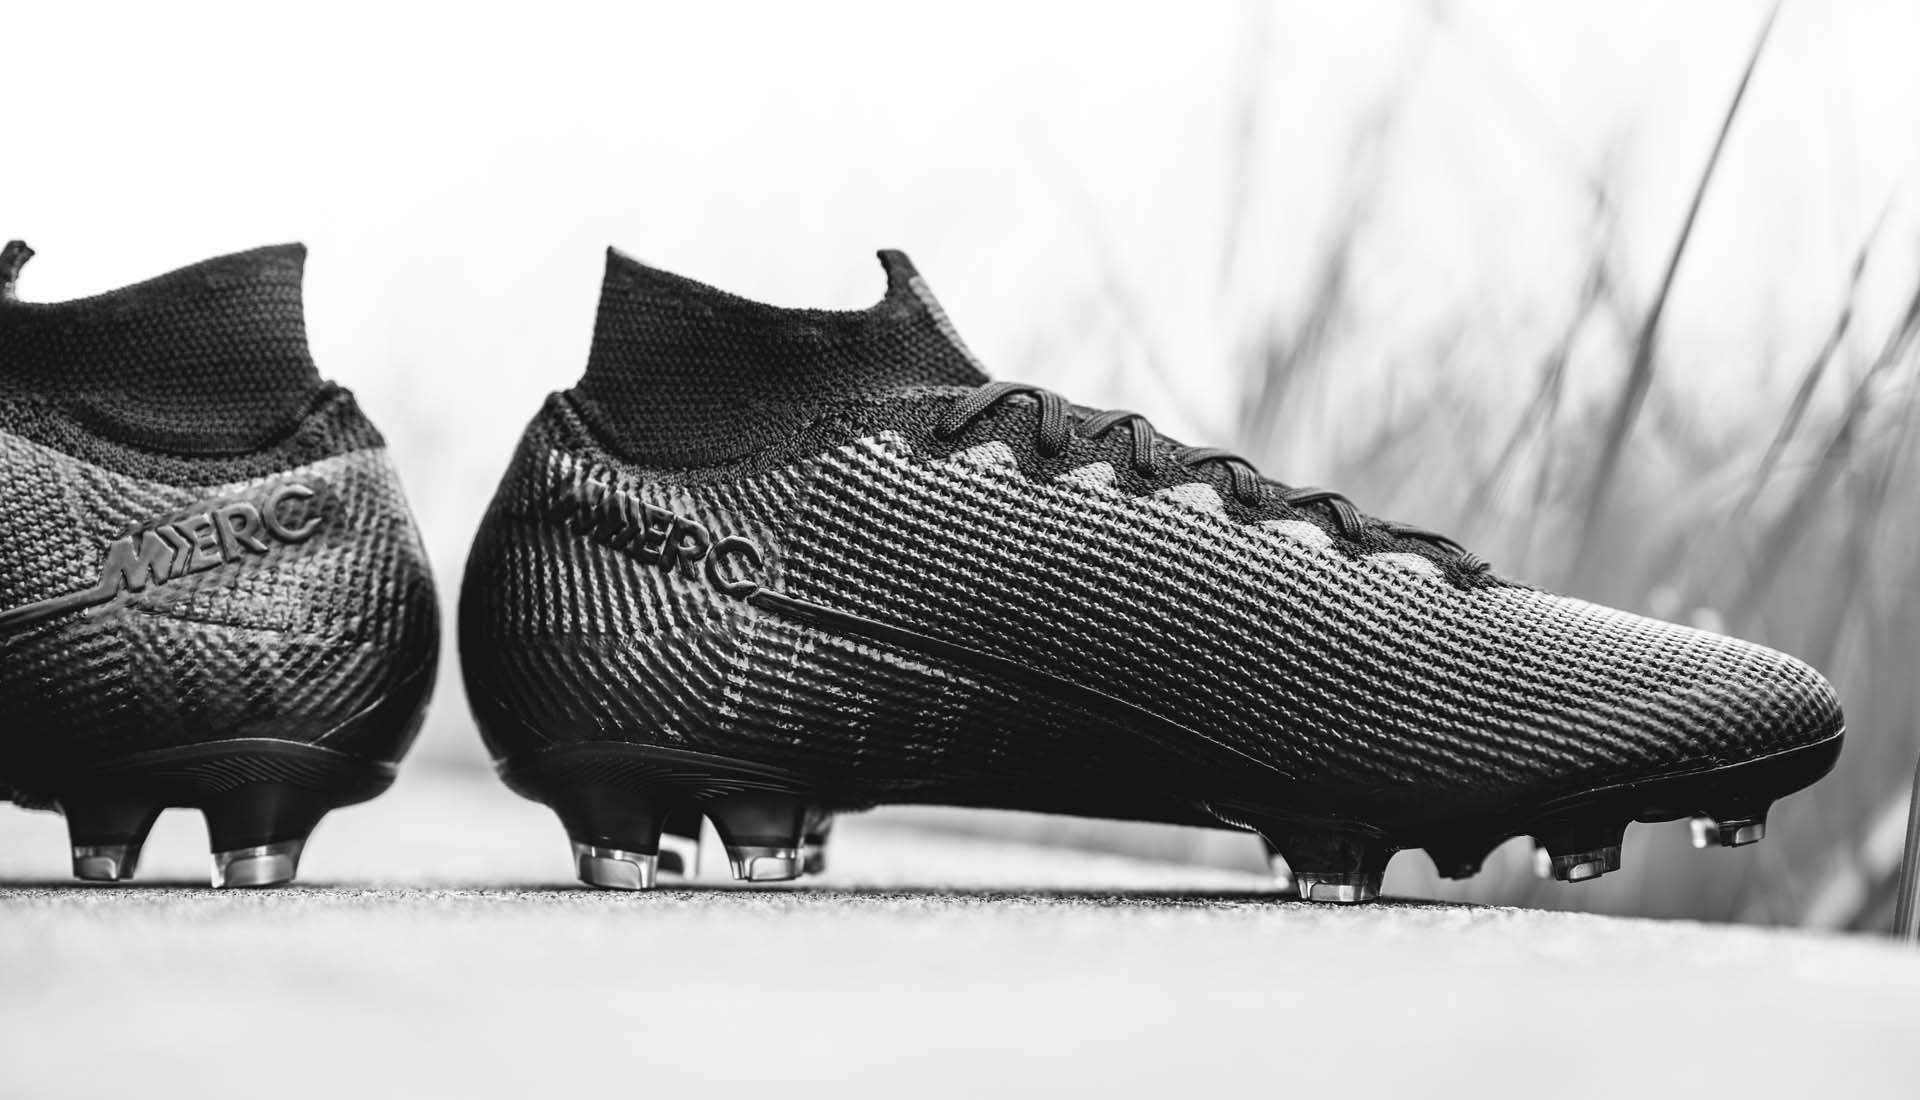 Botines Nike Mercurial Superfly Blancos Botines de Fútbol